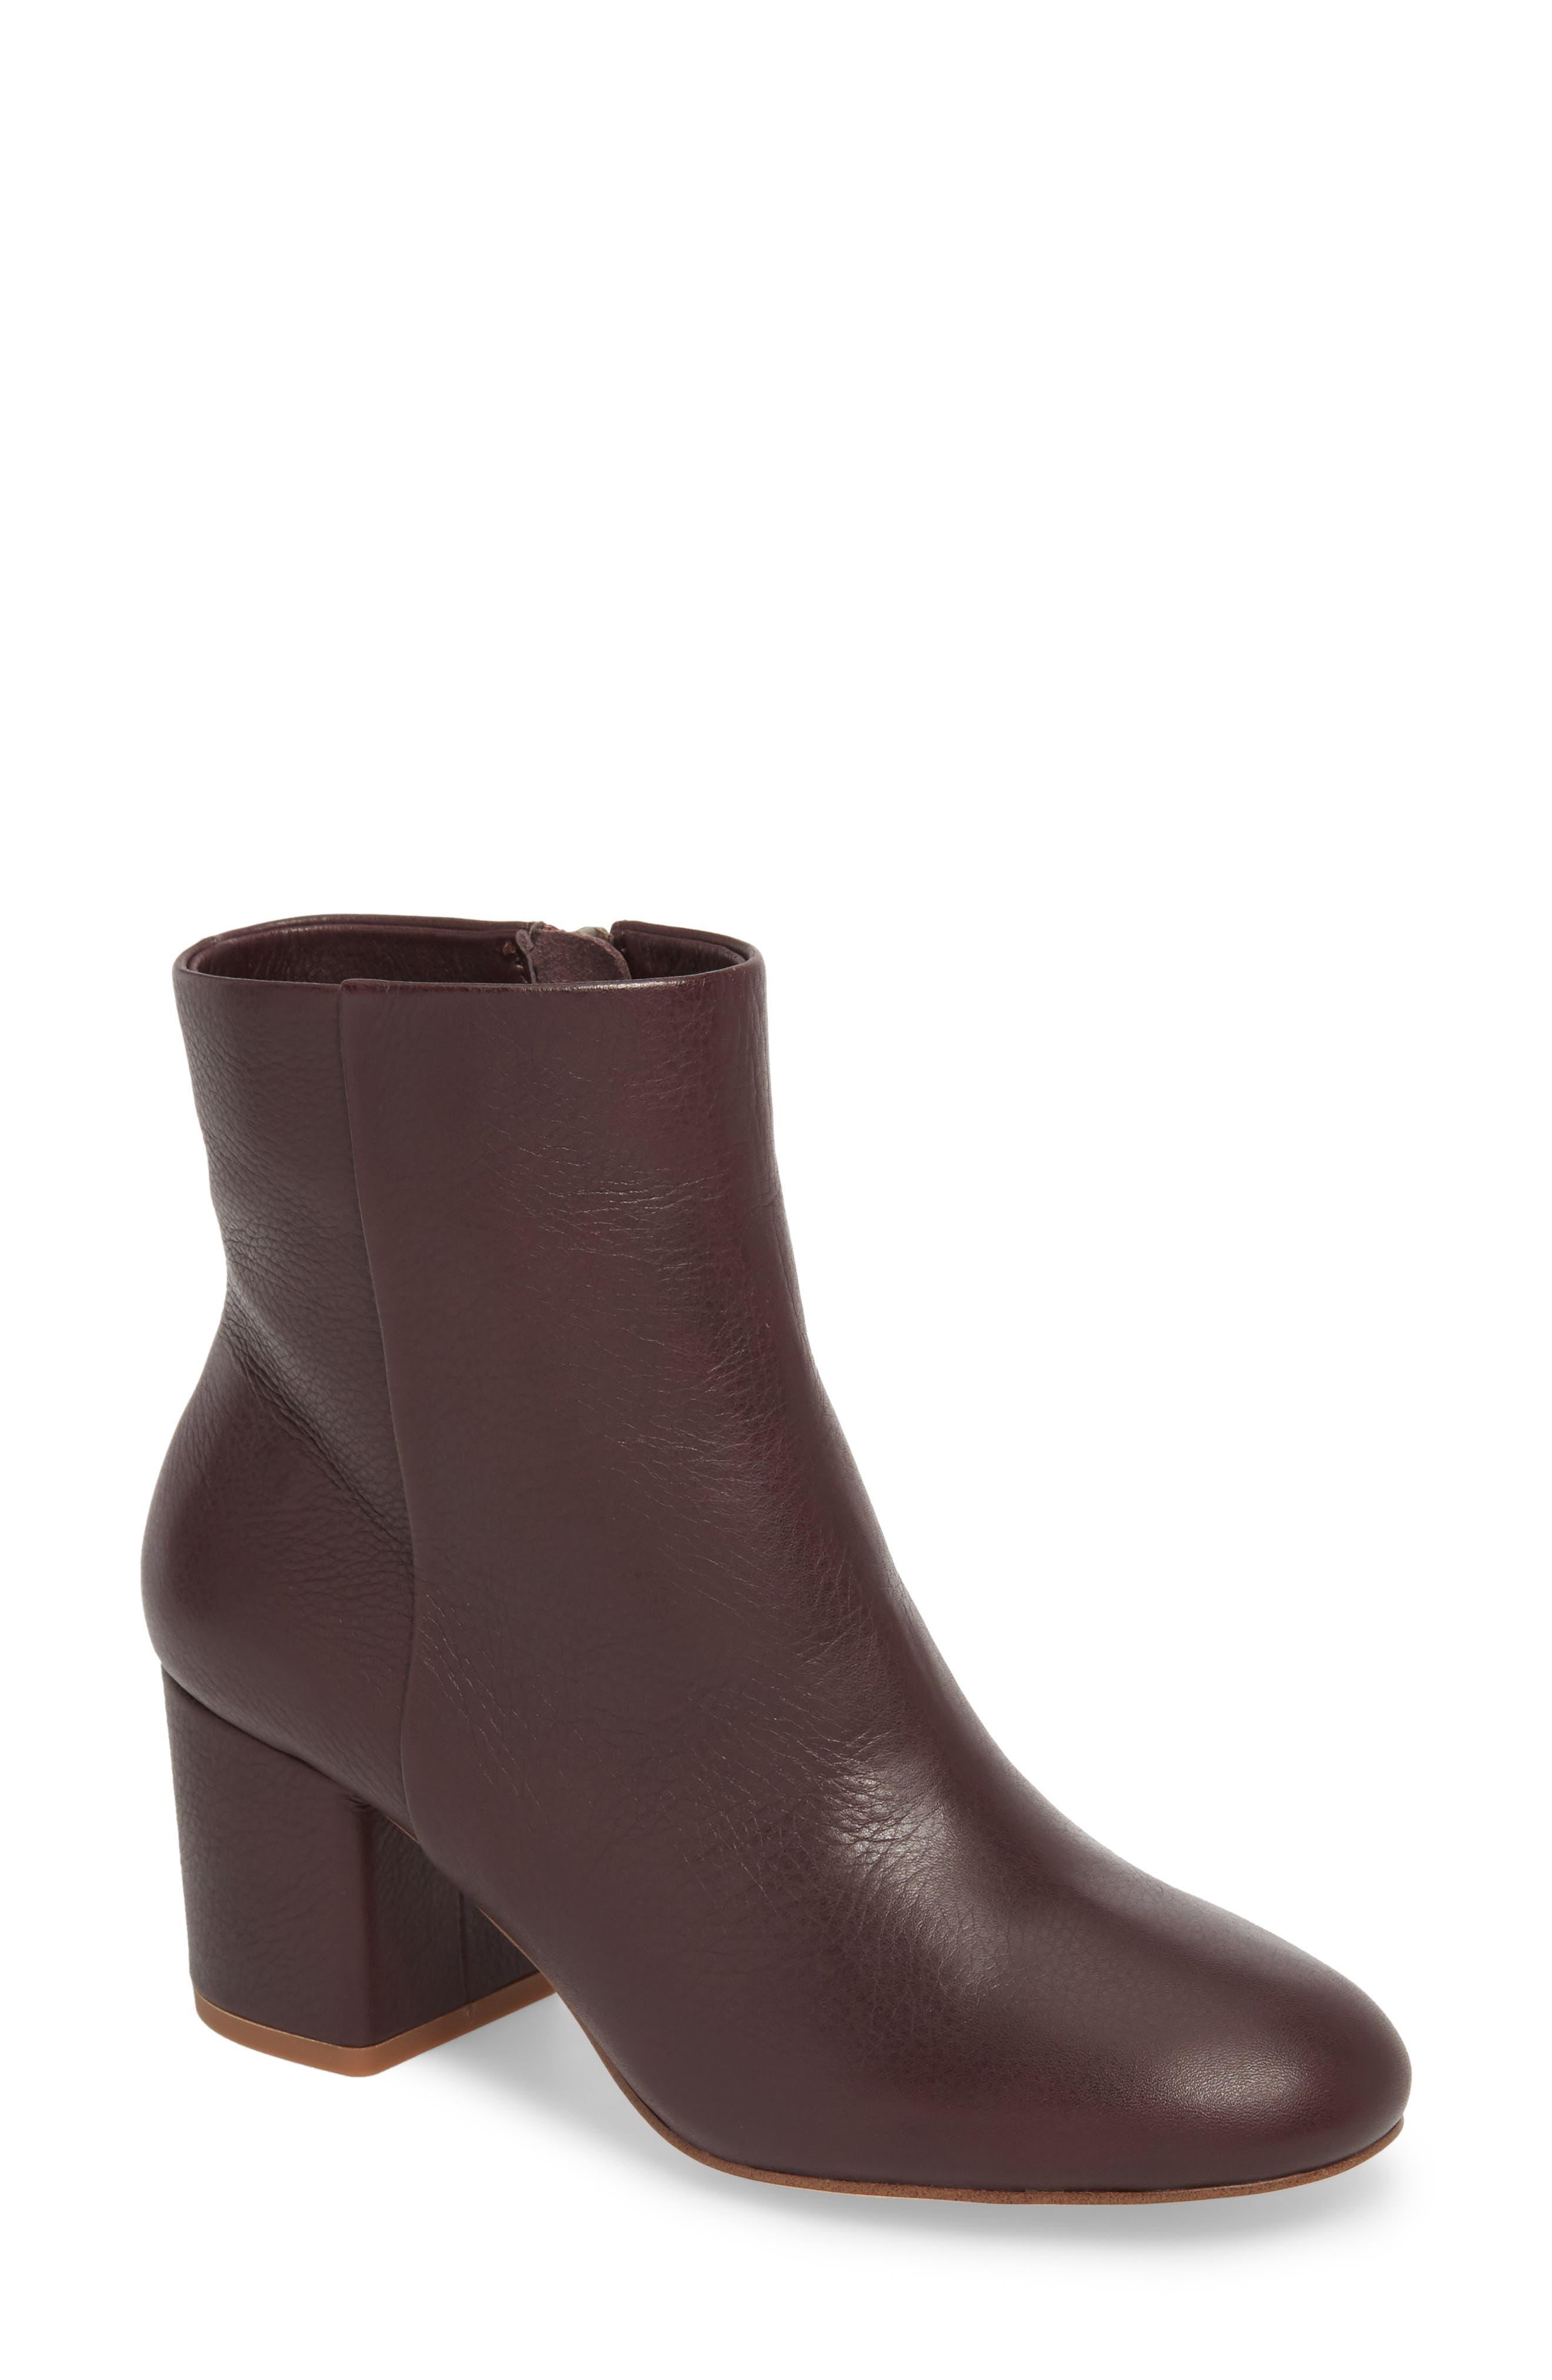 Nixie II Bootie,                         Main,                         color, Deep Plum Leather